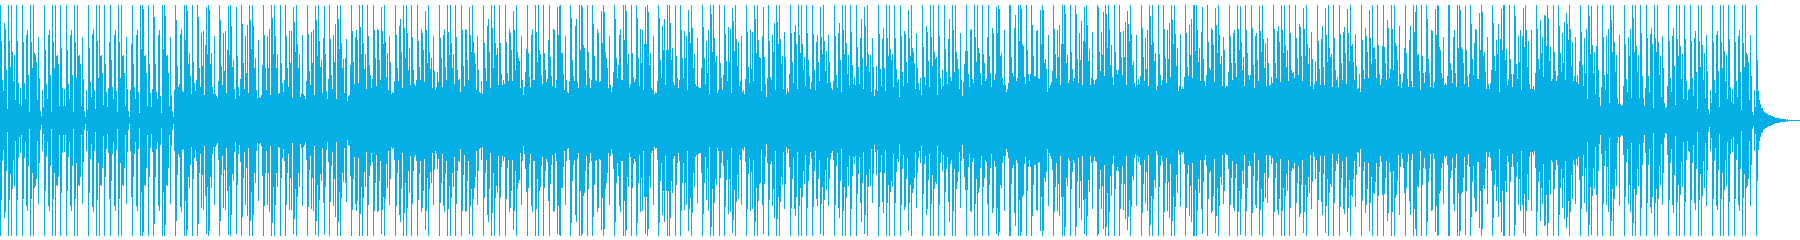 528Hz日常のストレス解放の瞑想曲3の再生済みの波形